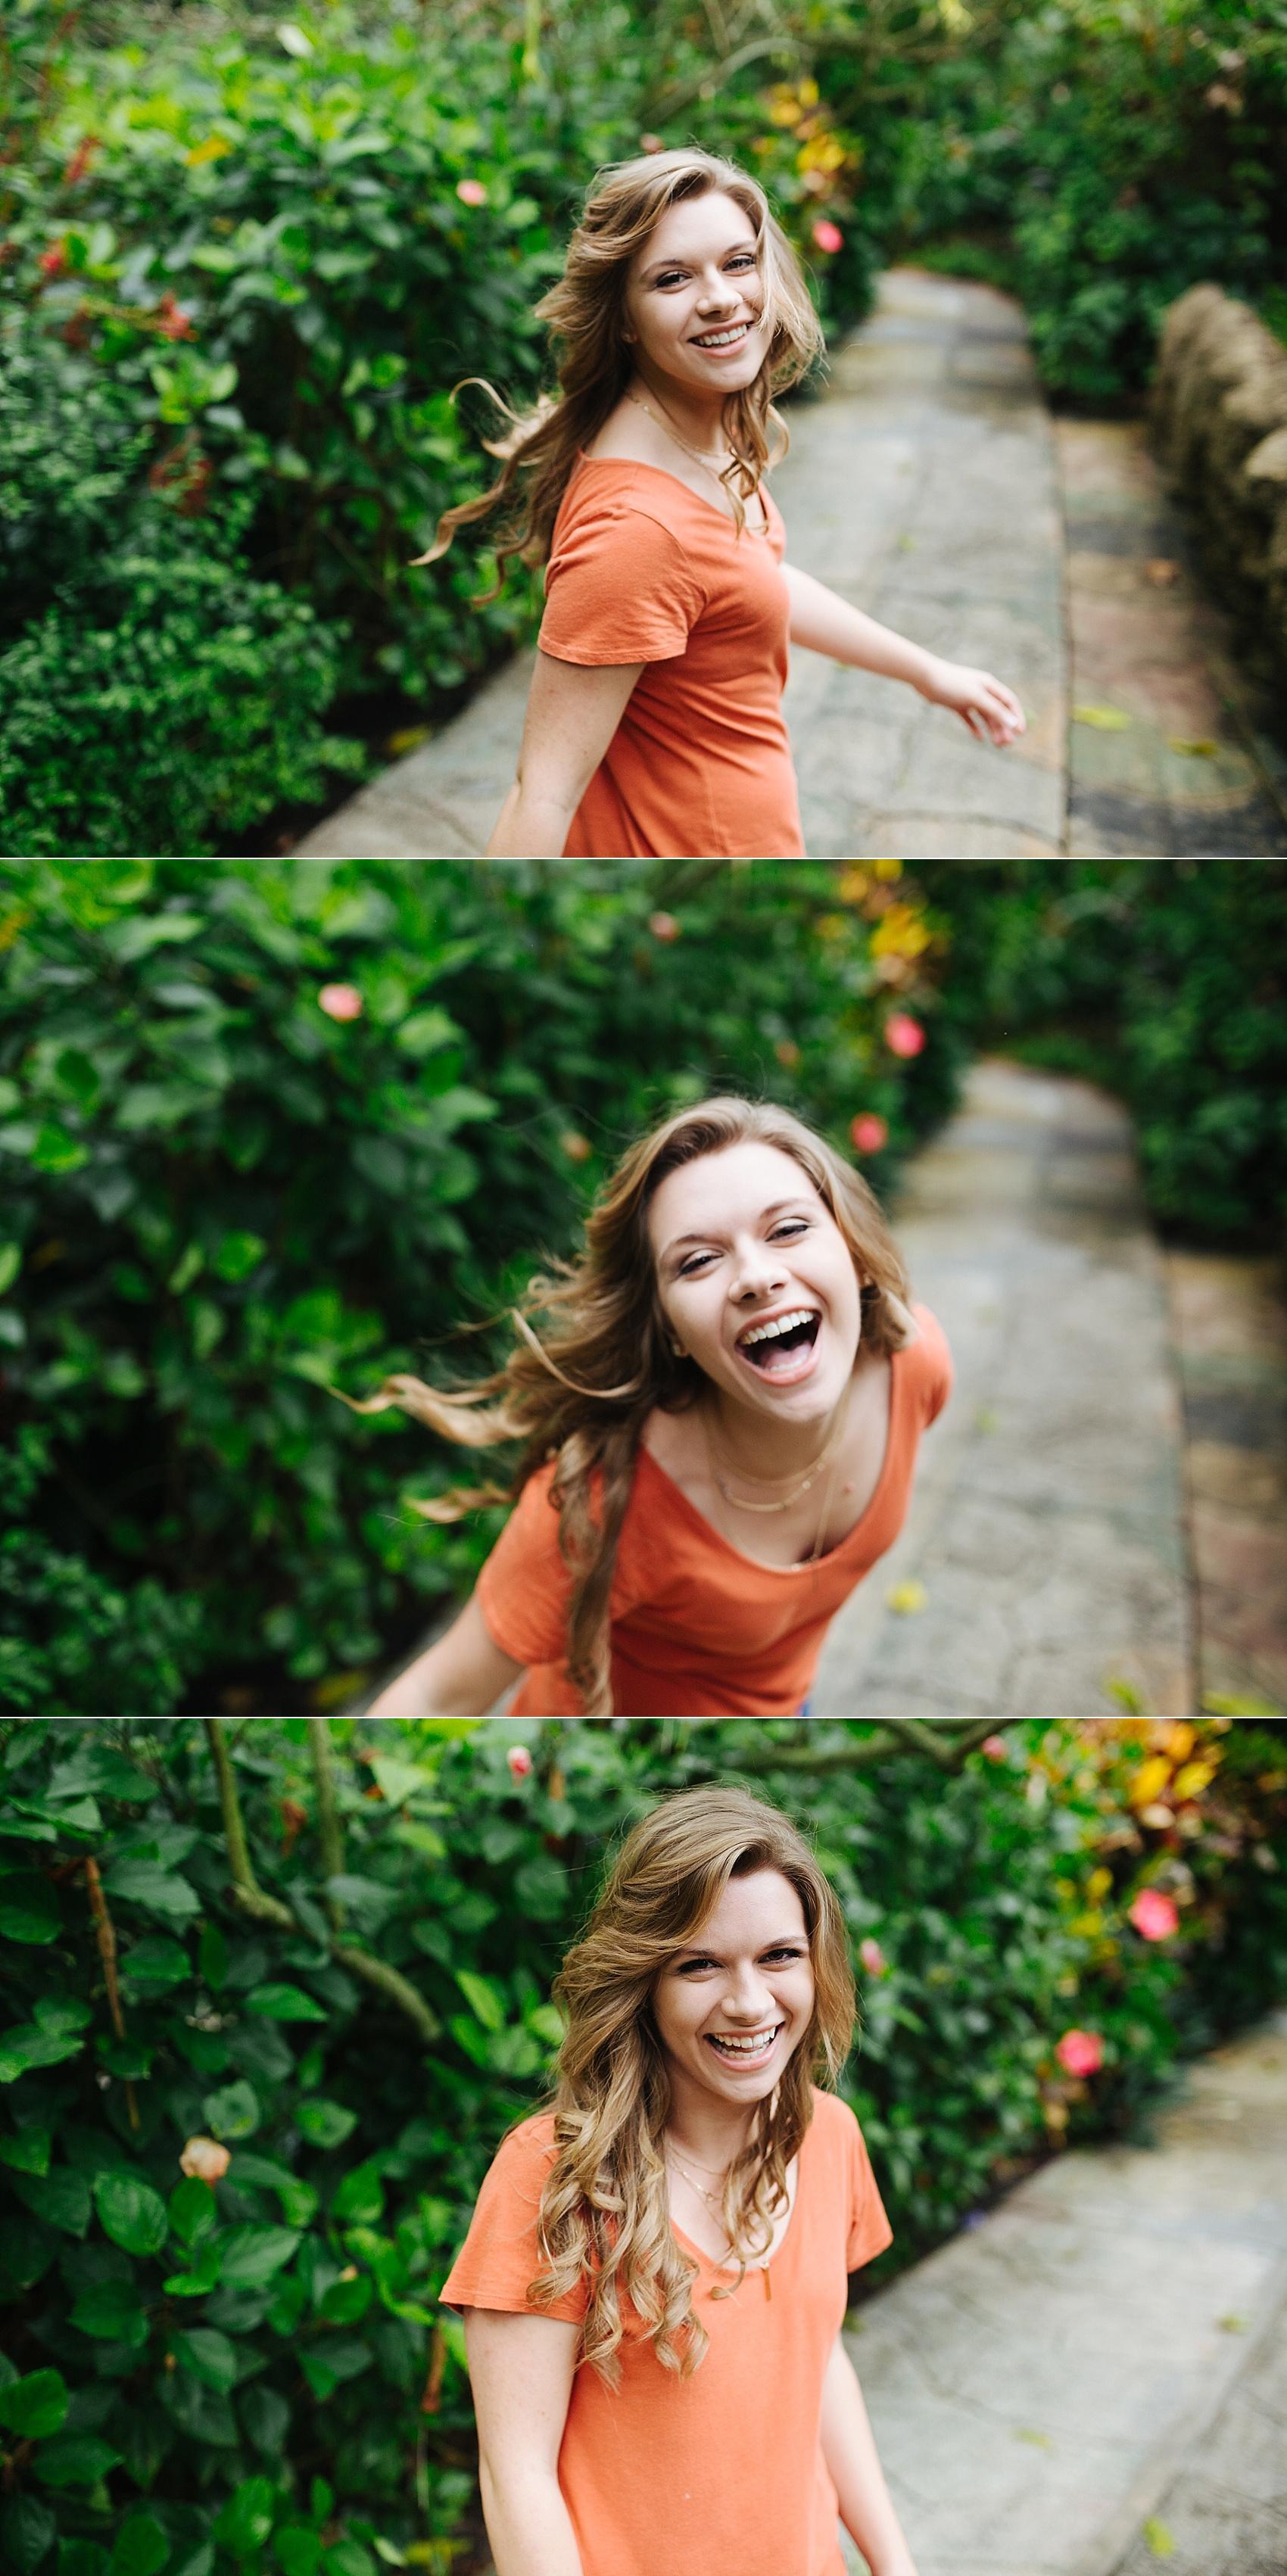 stpete senior portraits sunken gardens leah-7